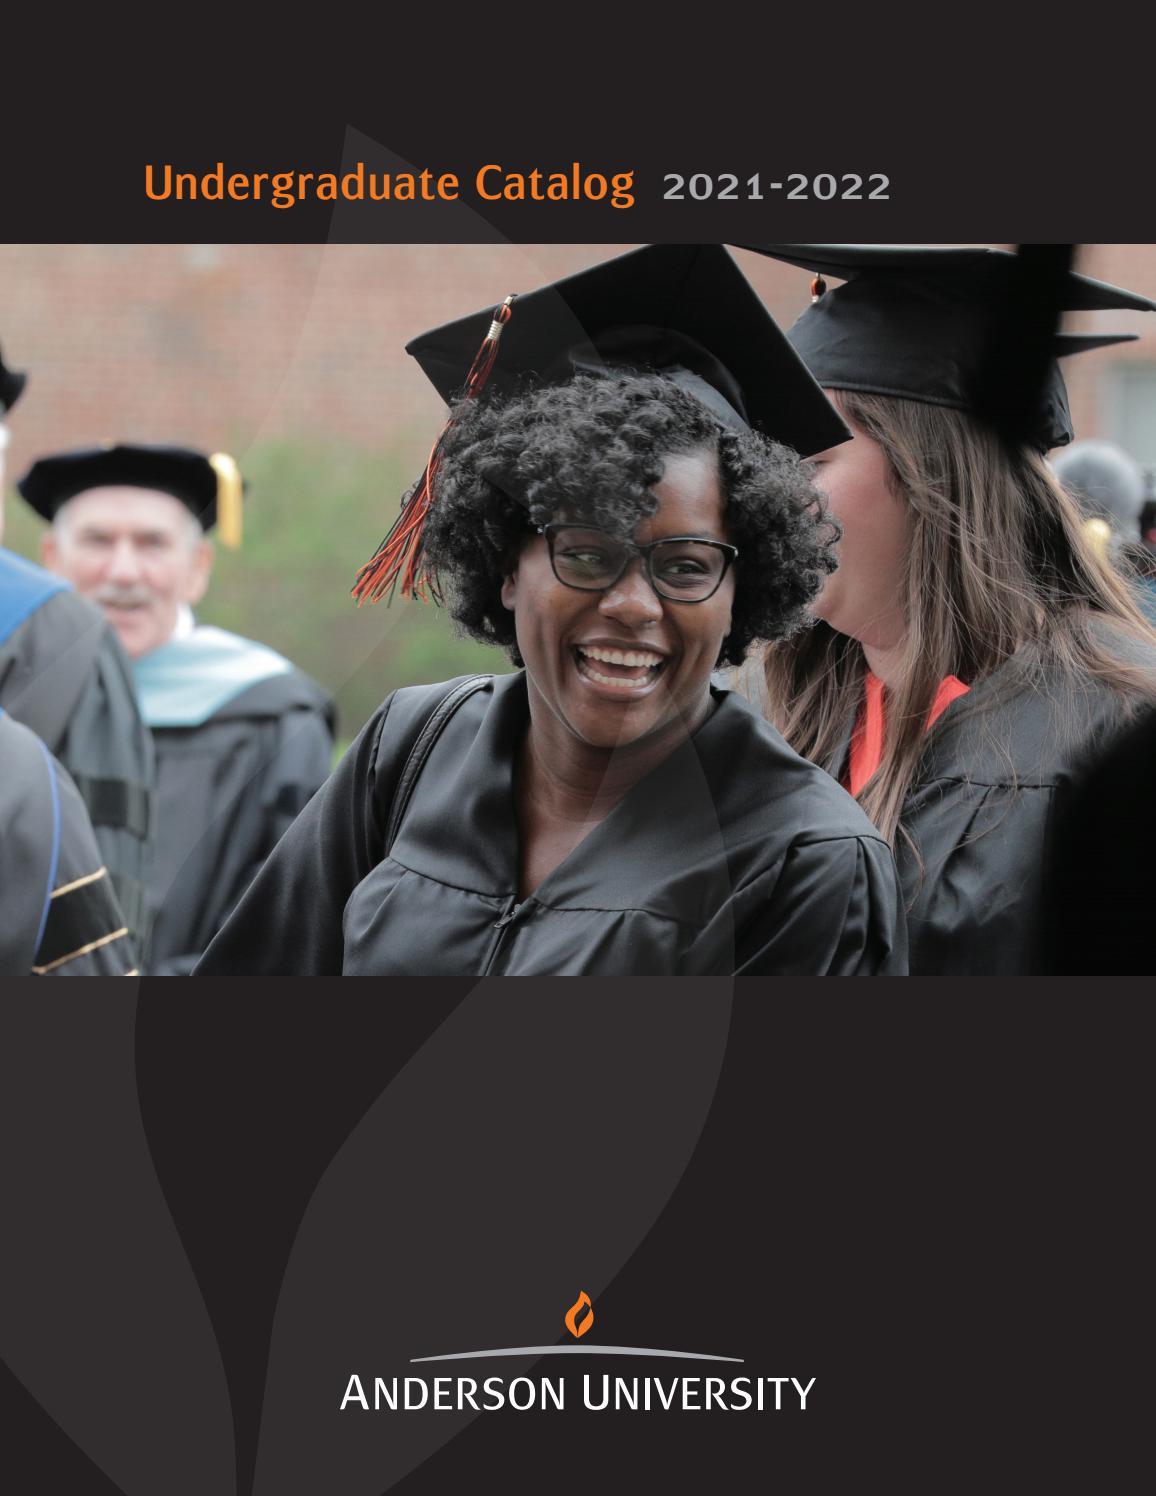 Miami University Academic Calendar 2022 23.Undergraduate Catalog 2021 2022 By Anderson University Issuu